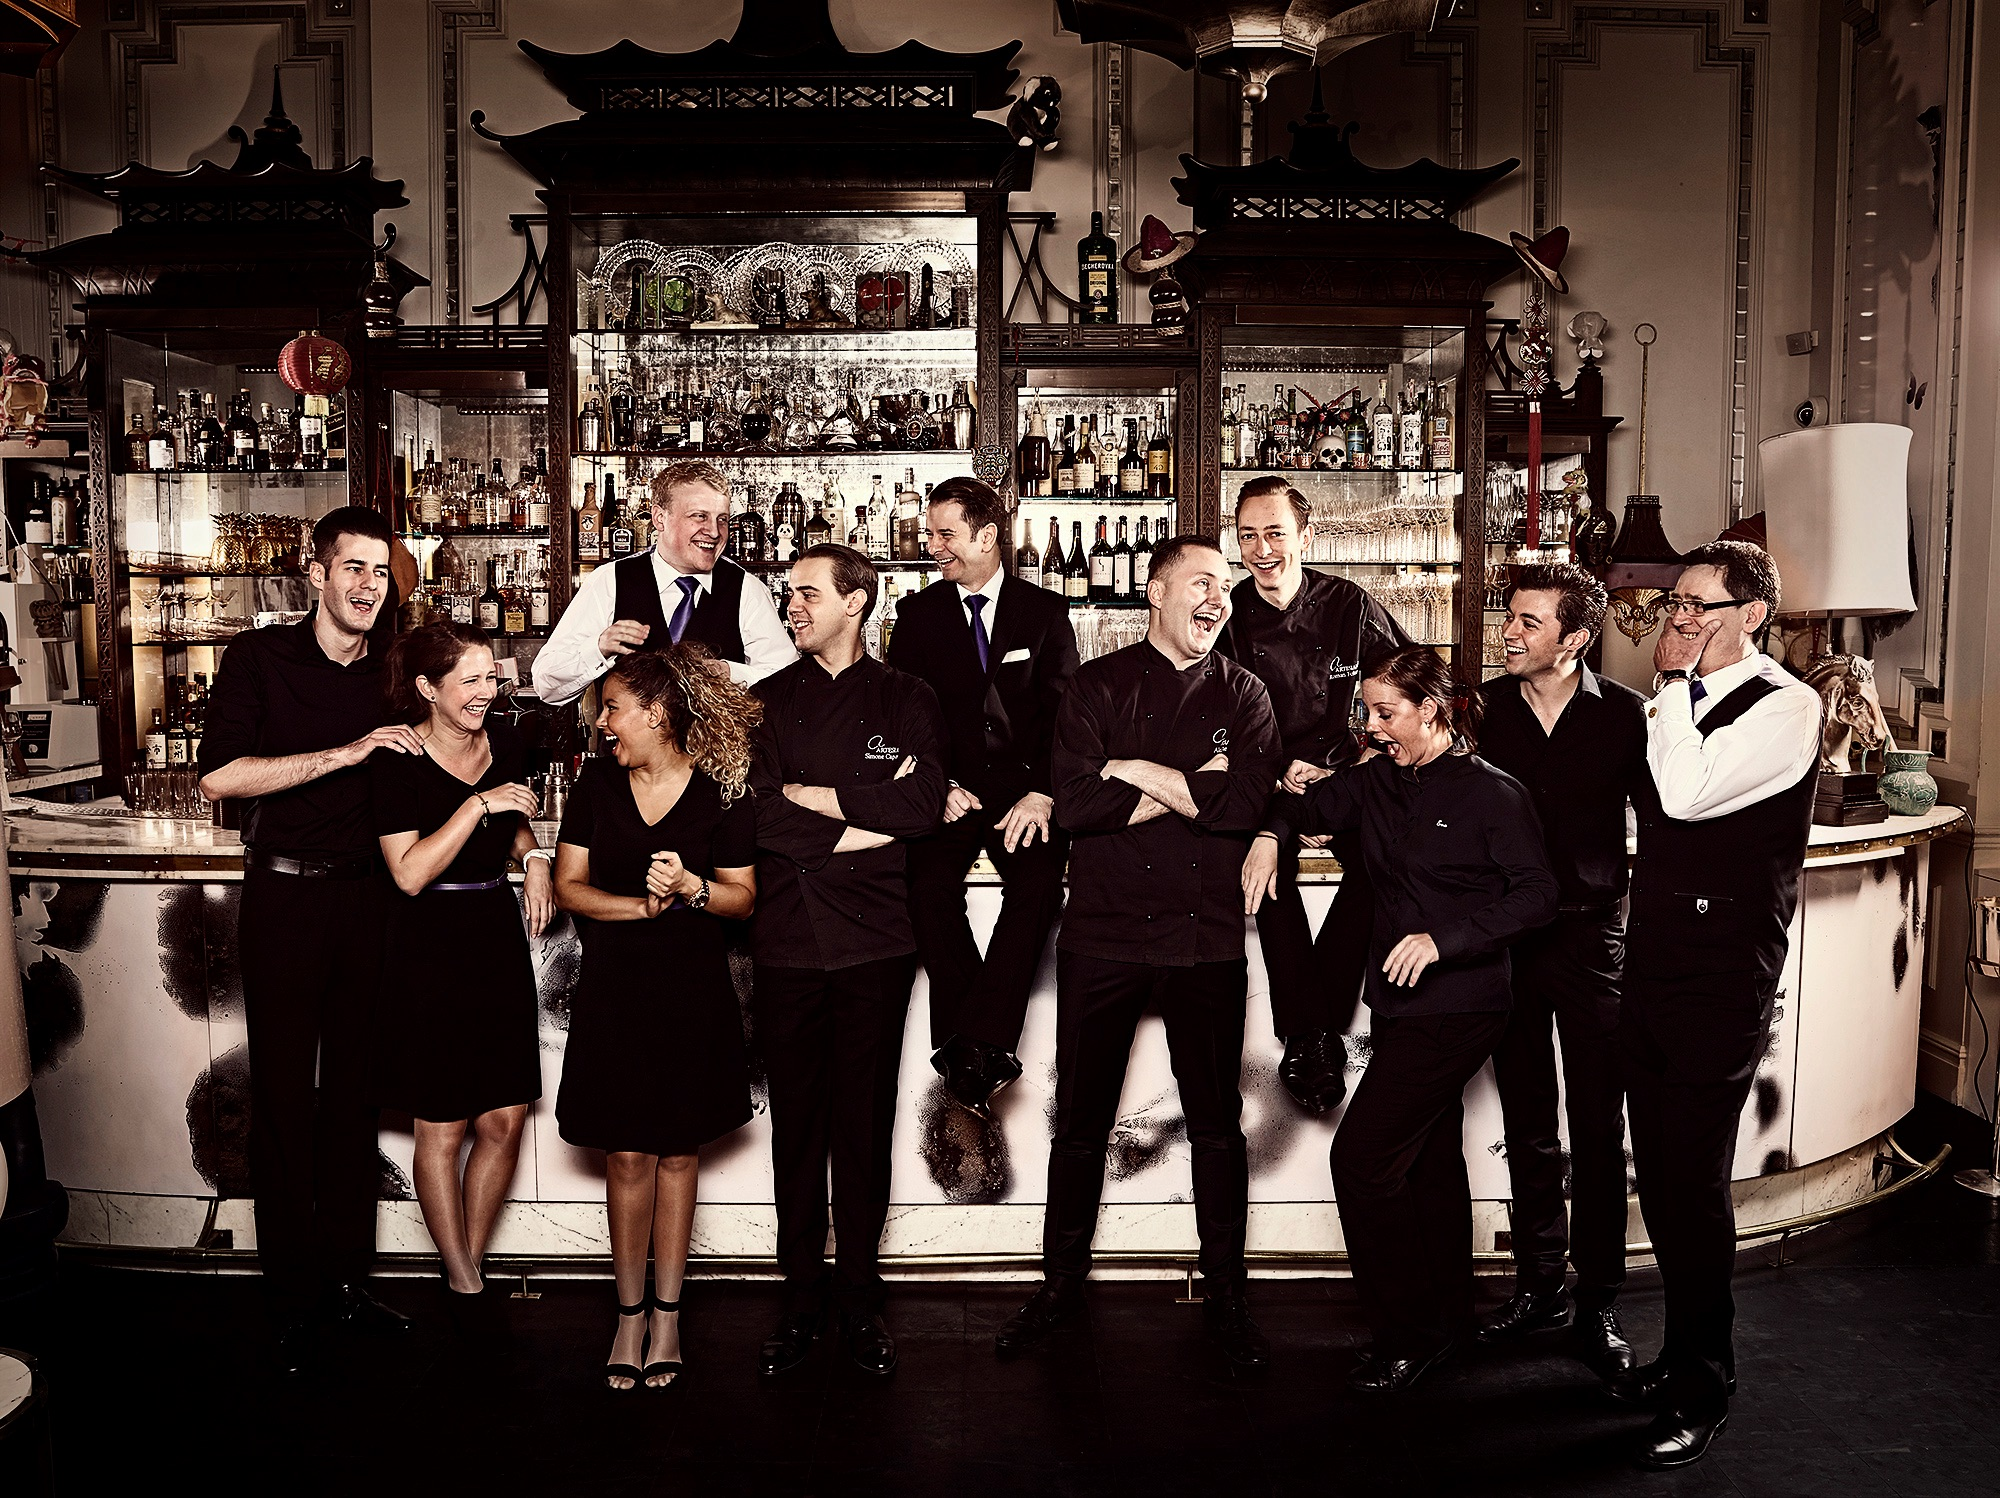 The Artesian Team - (London) - Ketel One Best Bar in Europe & the World